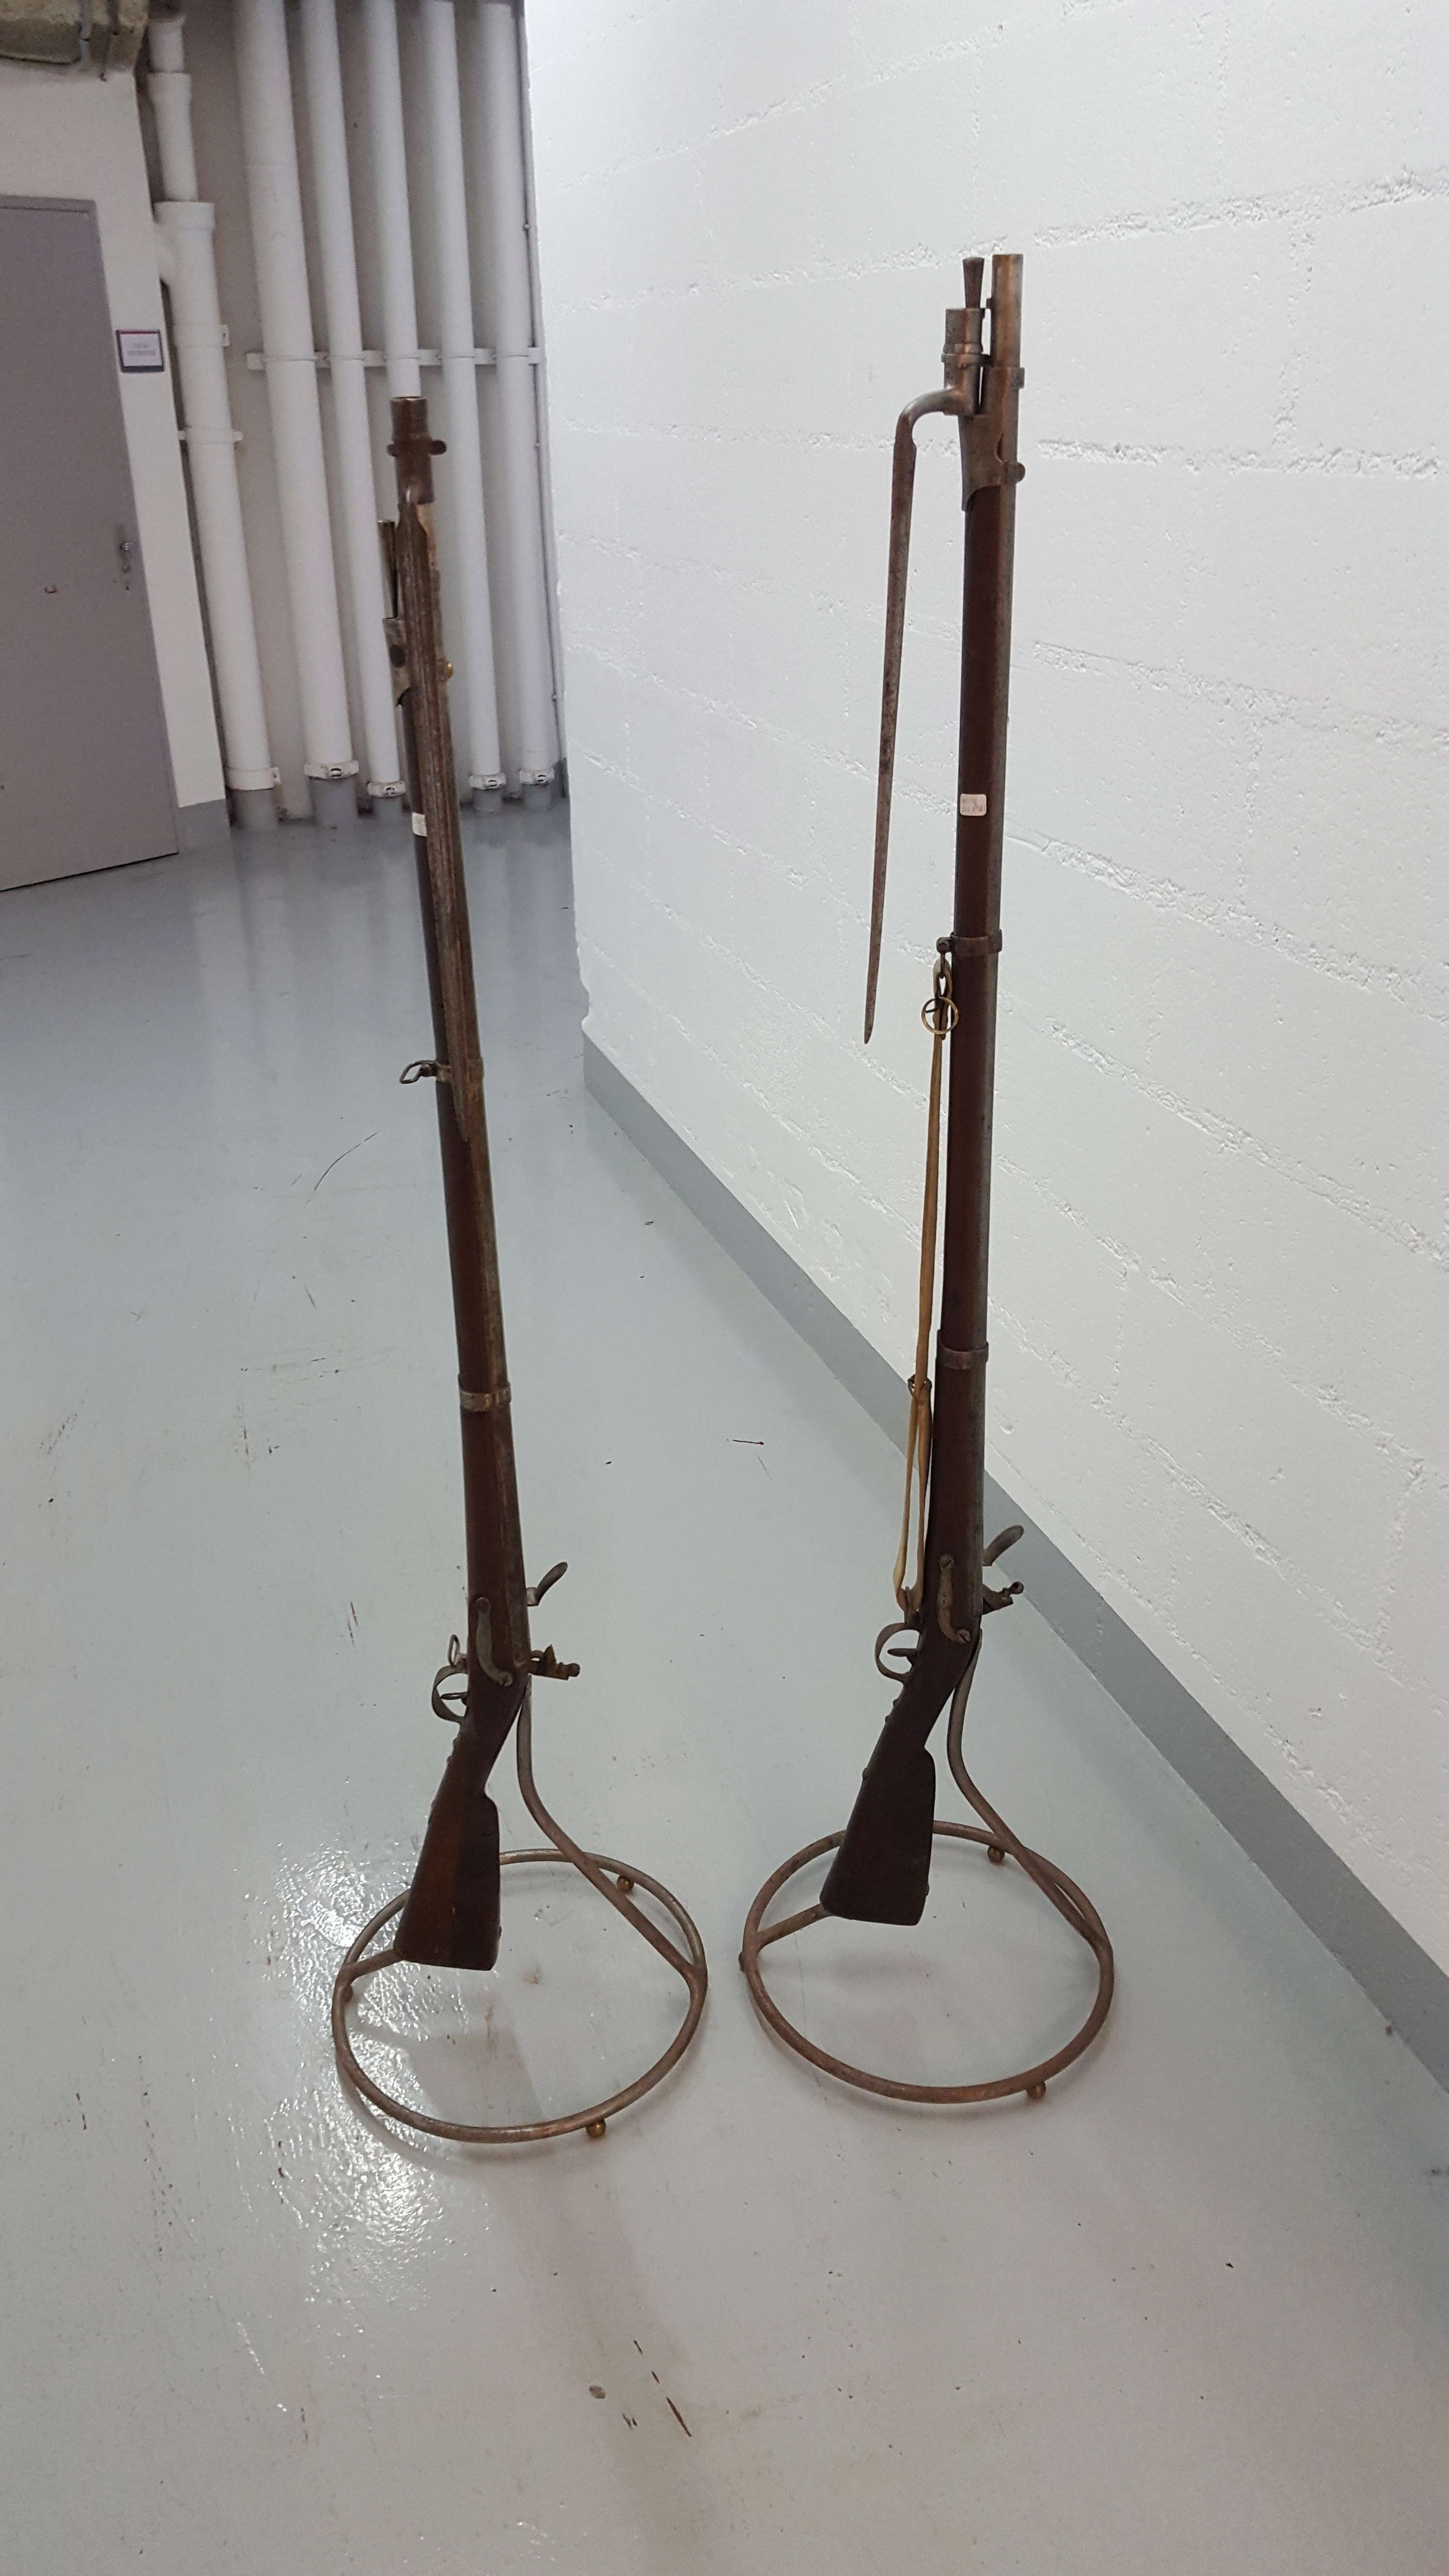 Sauvetage de 2 fusils an IX 20180513